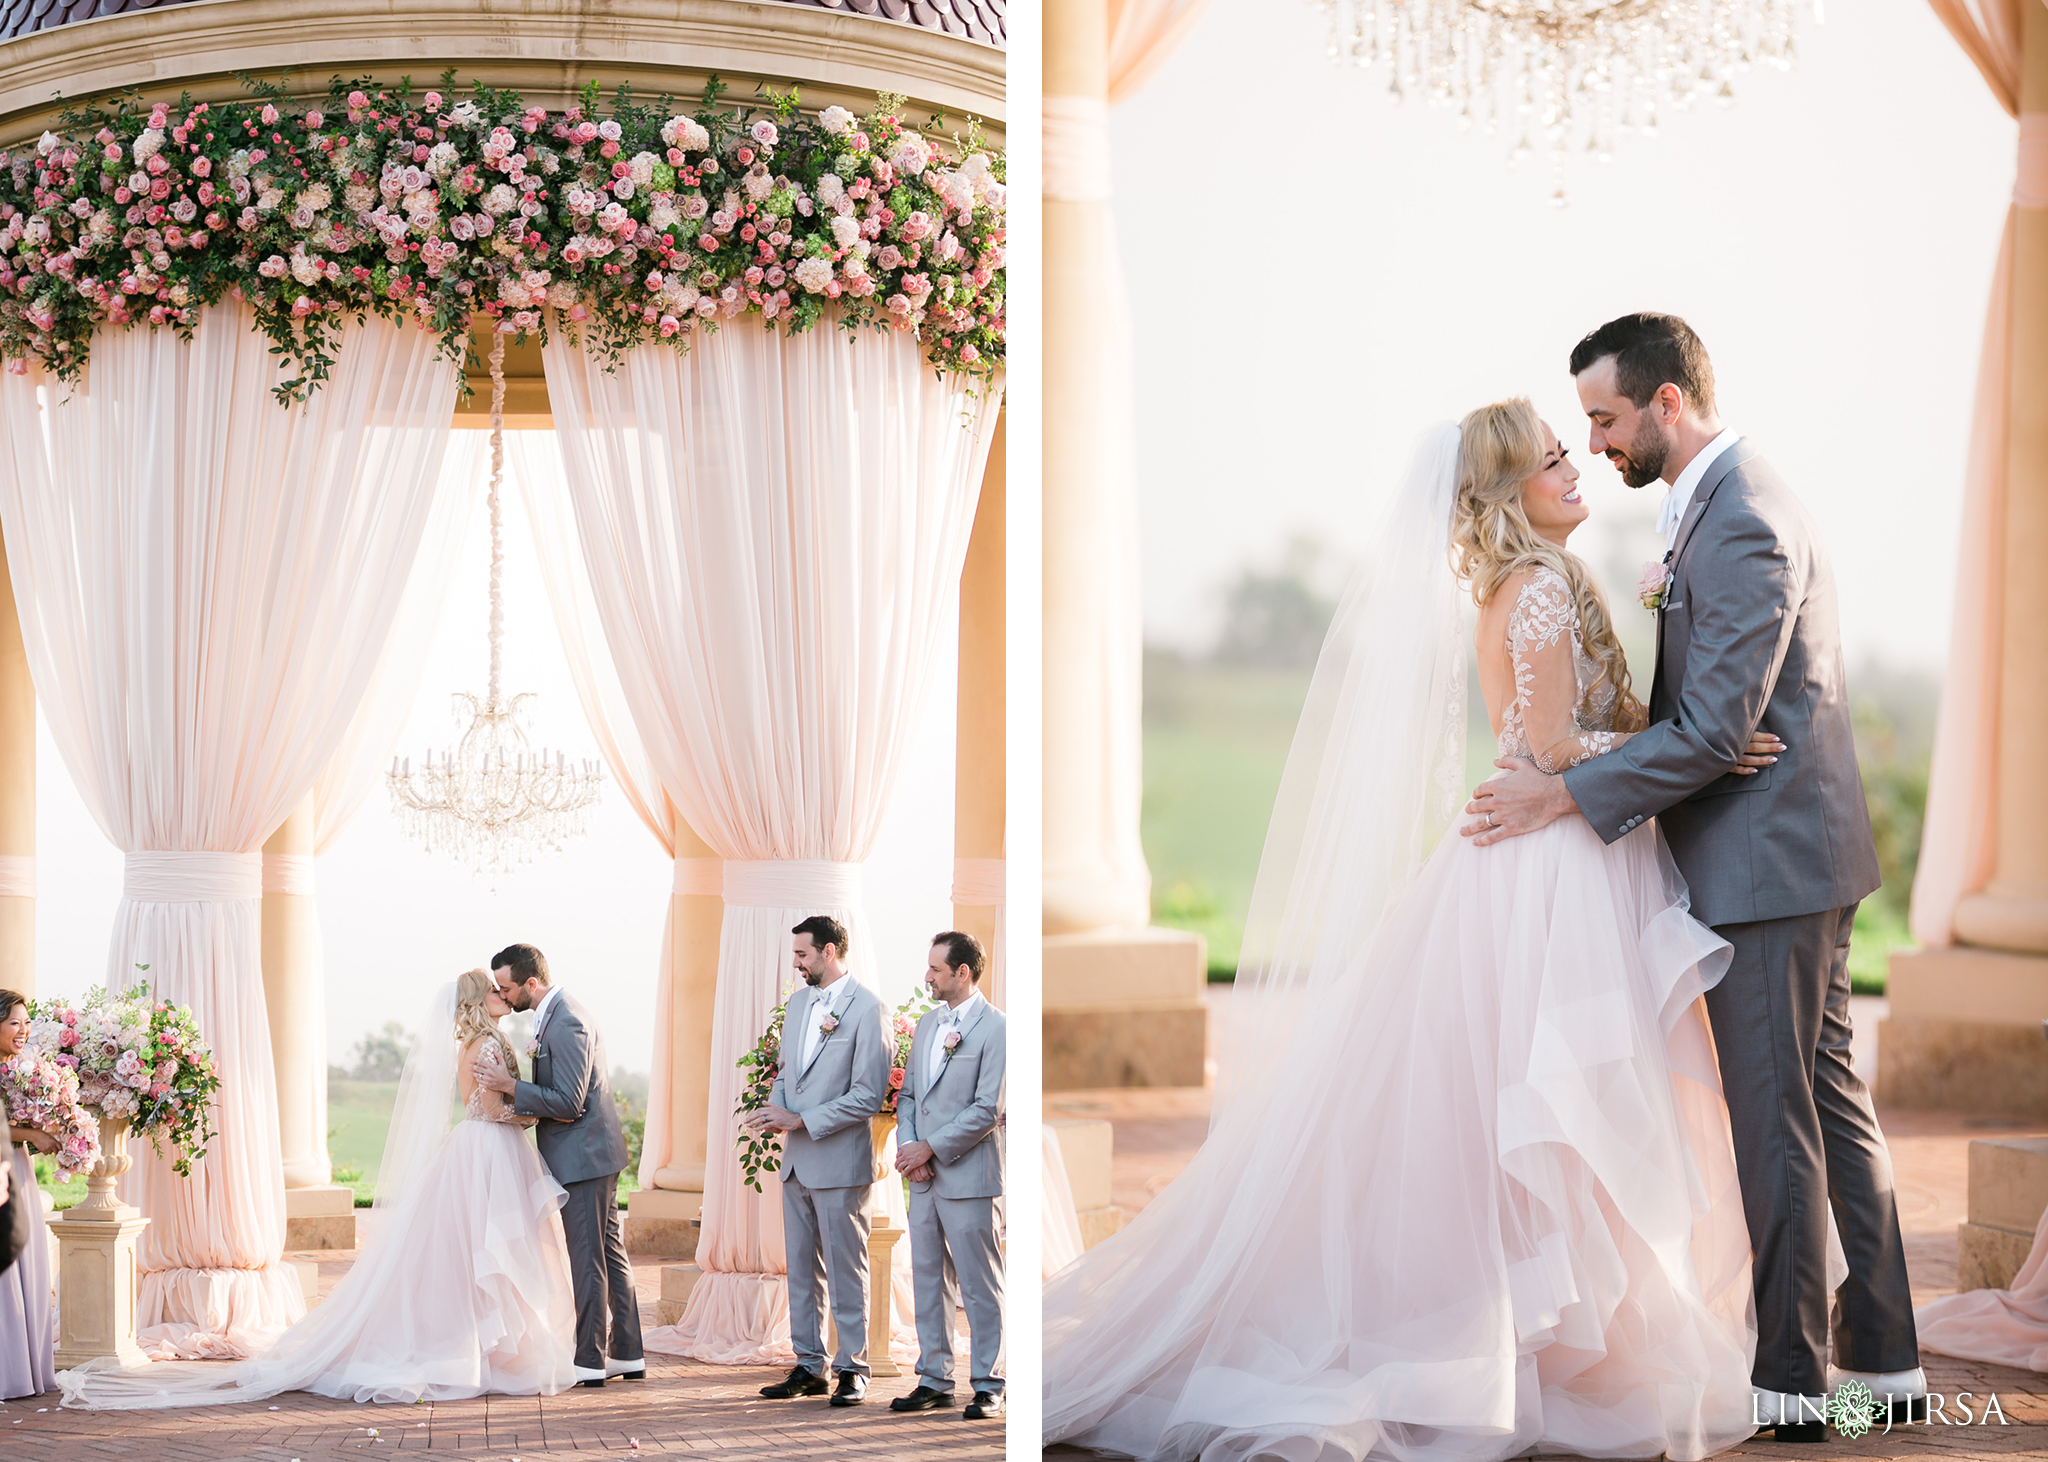 24-pelican-hill-resort-orange-county-wedding-photography